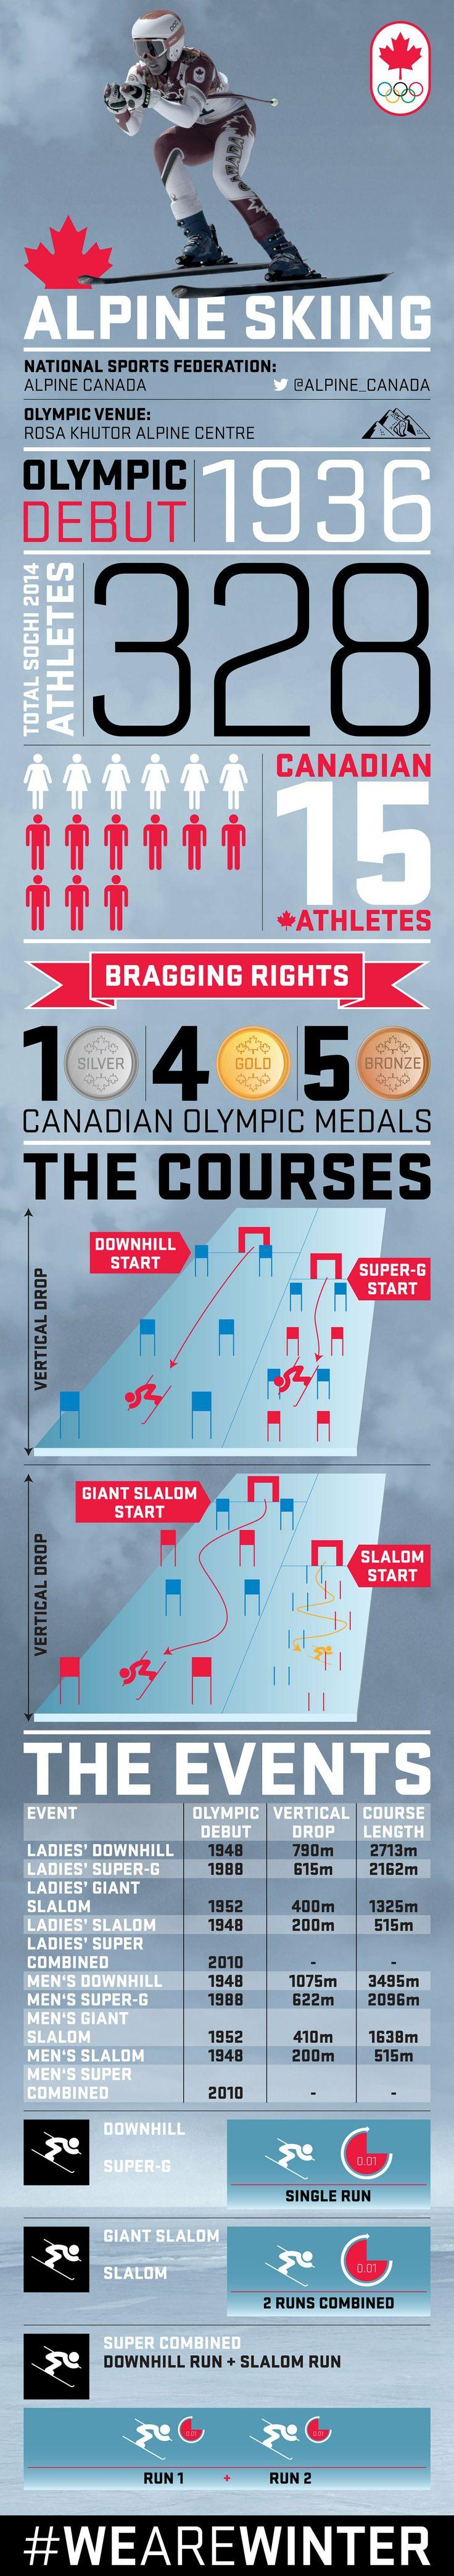 Alpine Skiing infographic from olympic.ca #TeamCanada #Canada #WeAreWinter #AlpineSkiing